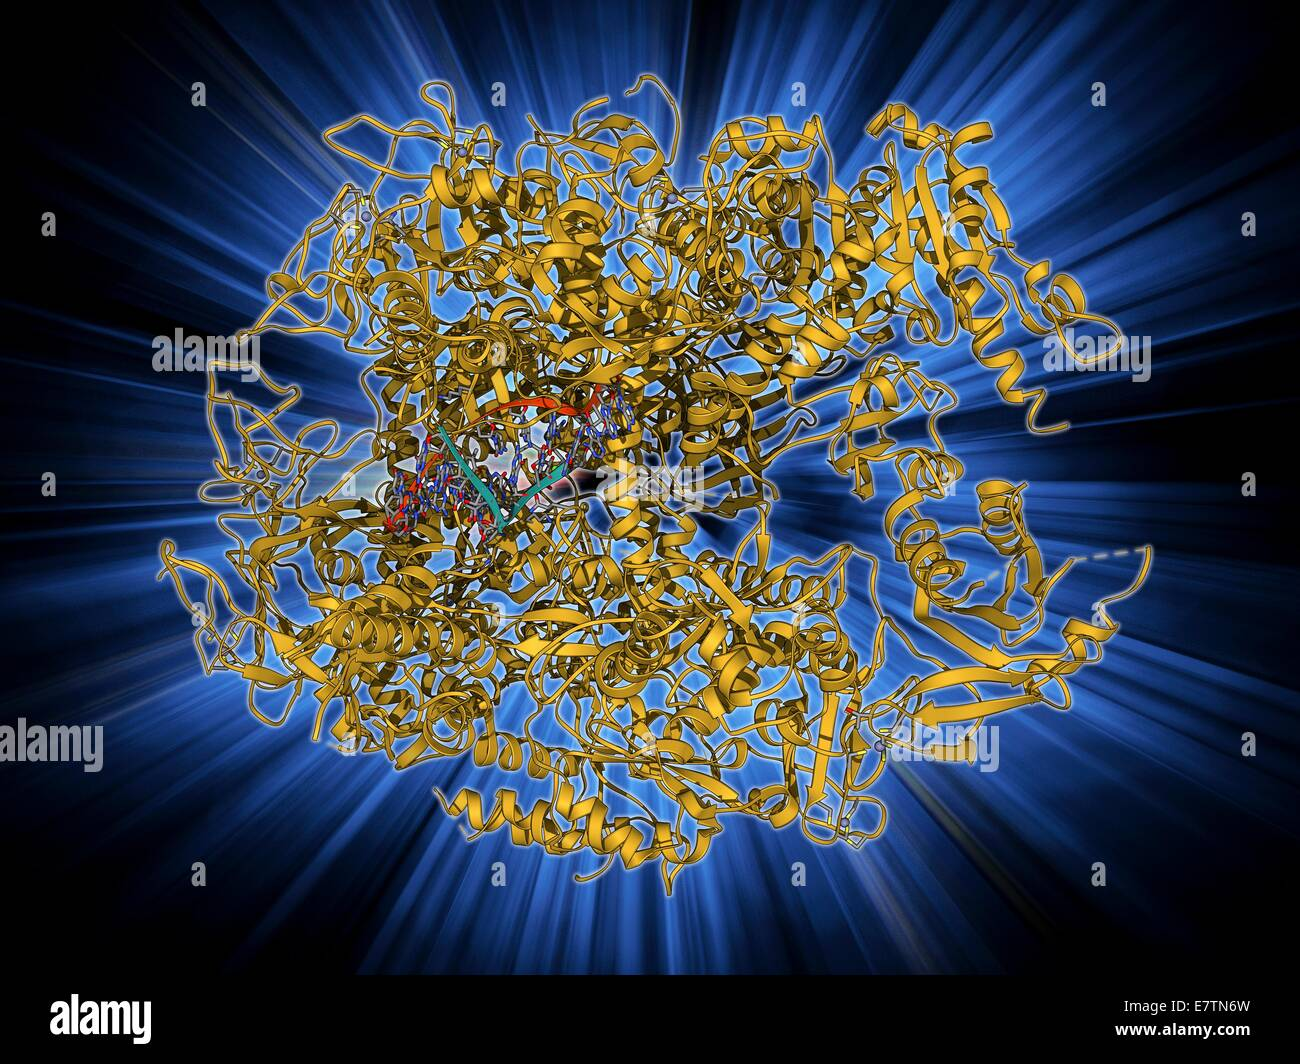 DNA-Transkription. Molekülmodell des Enzyms RNA-Polymerase II, die ...